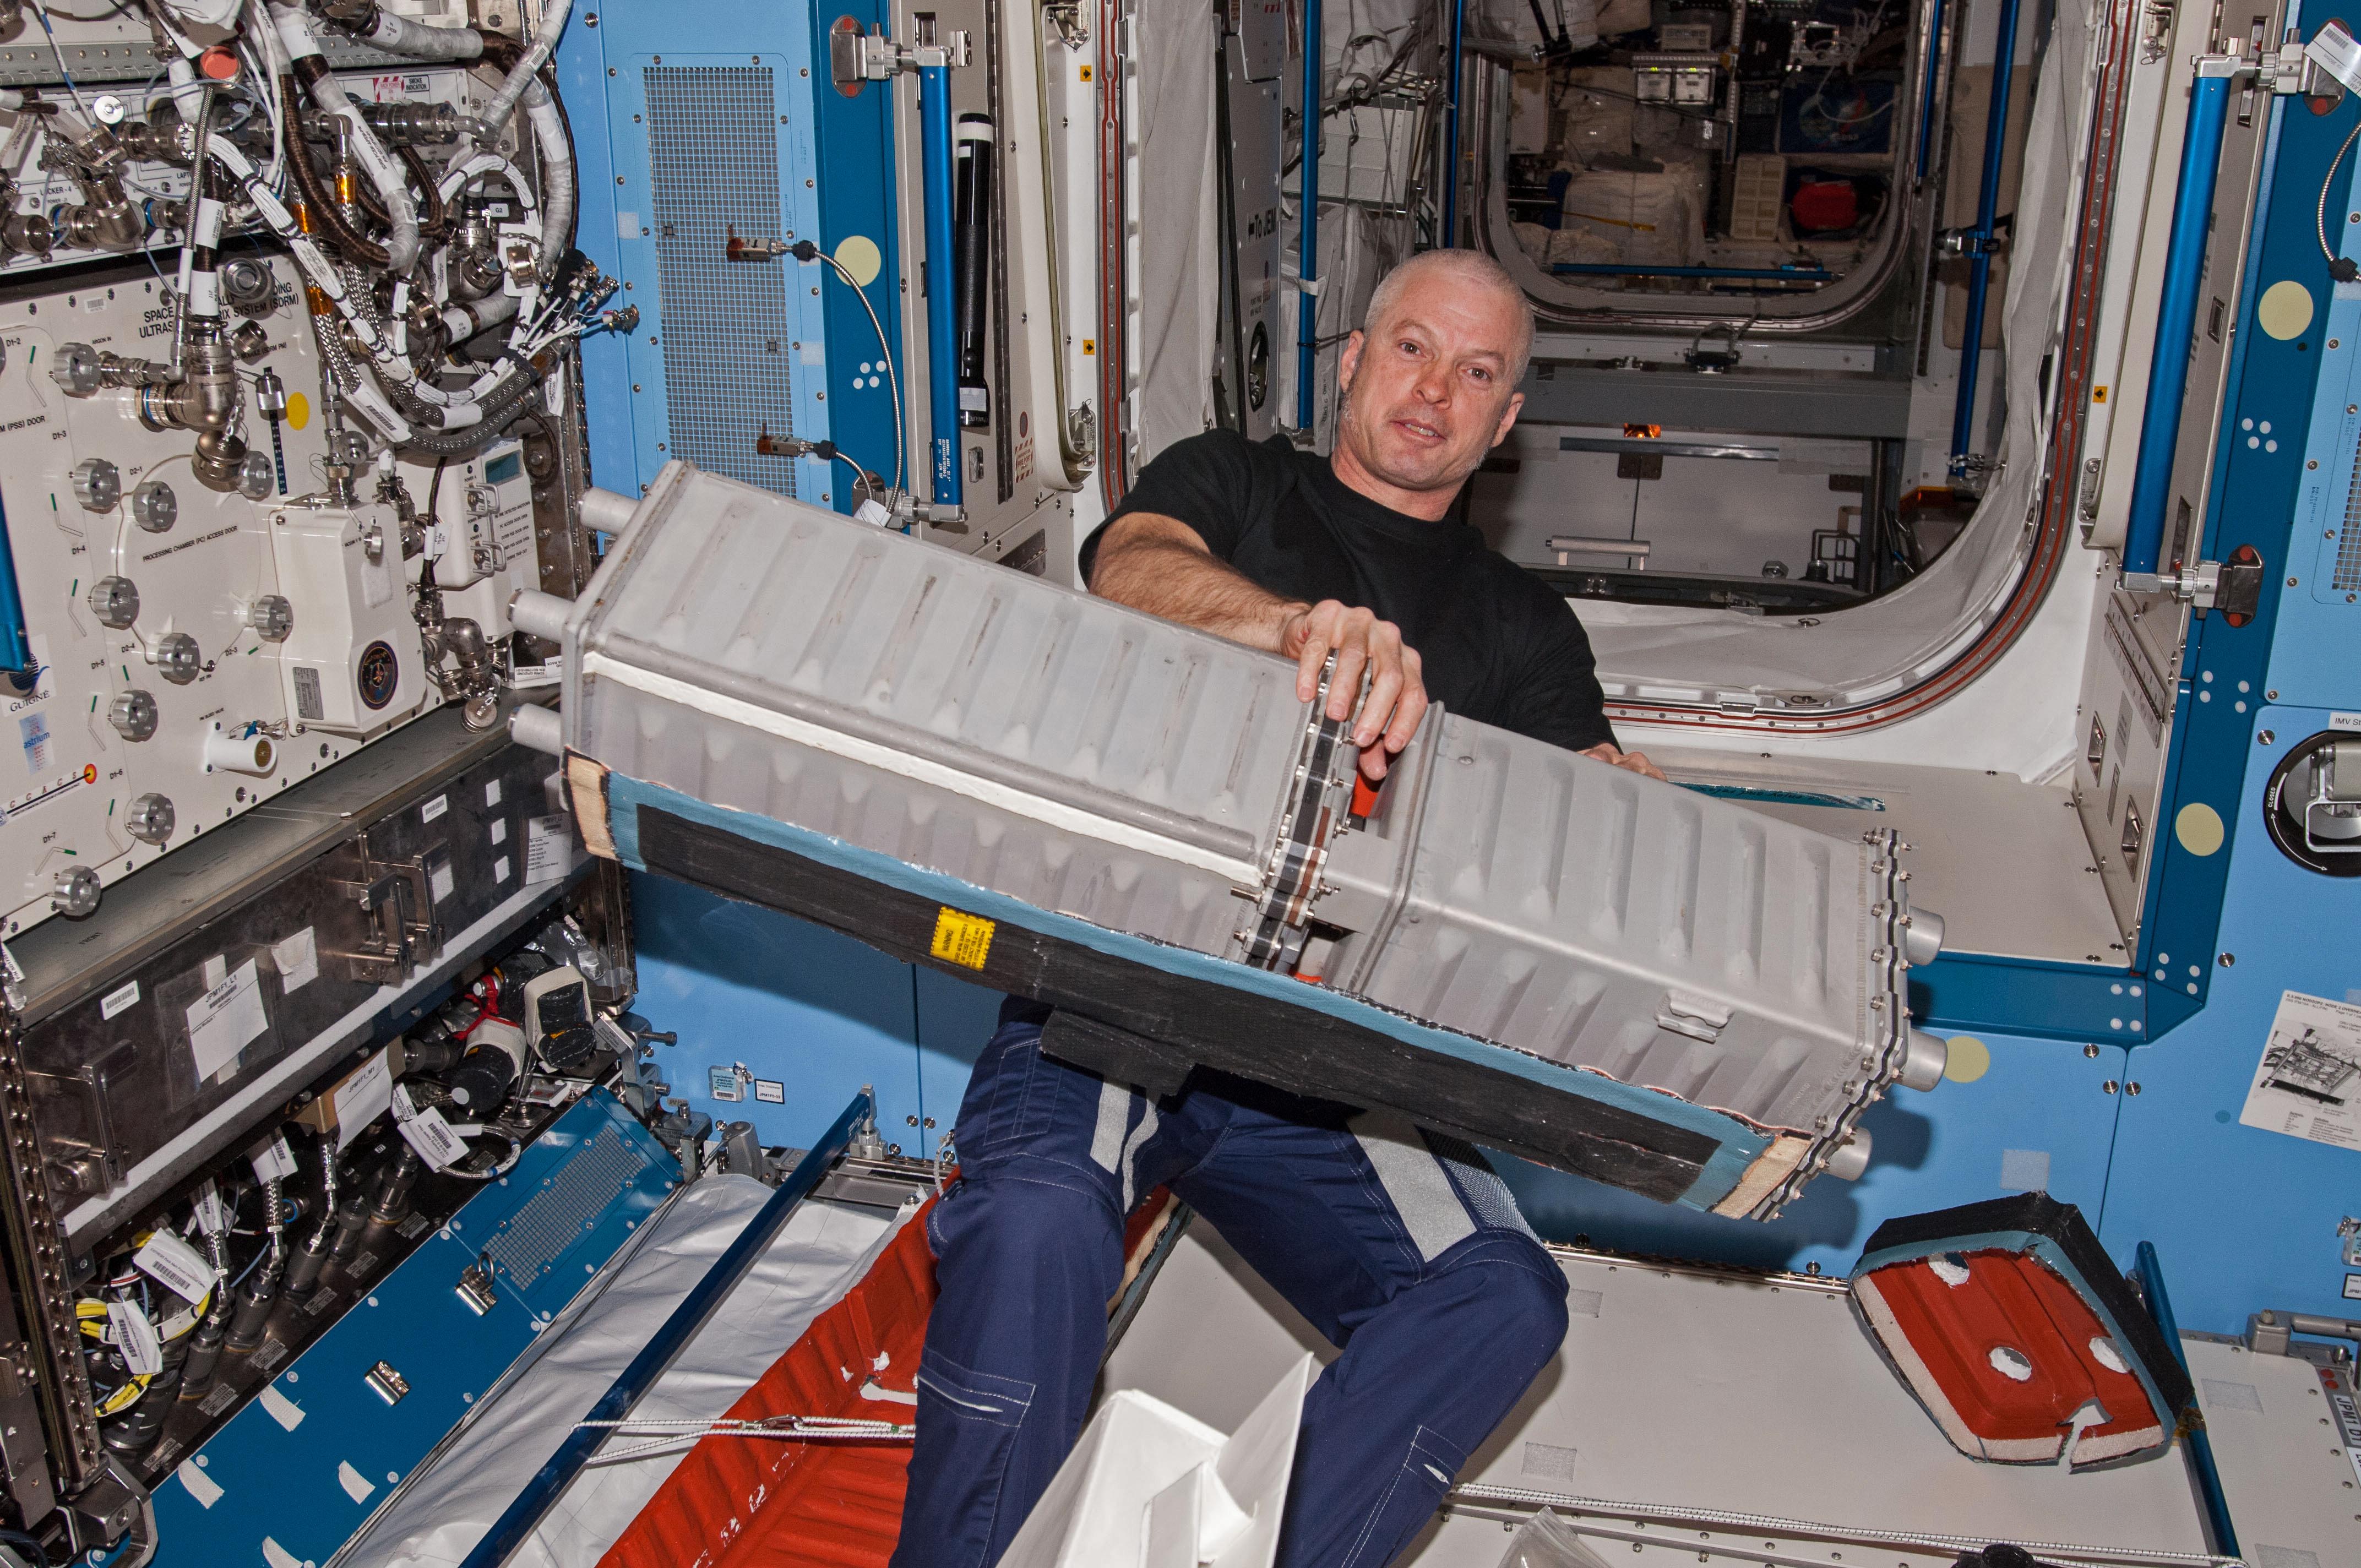 ISS CO2 Steve Swanson